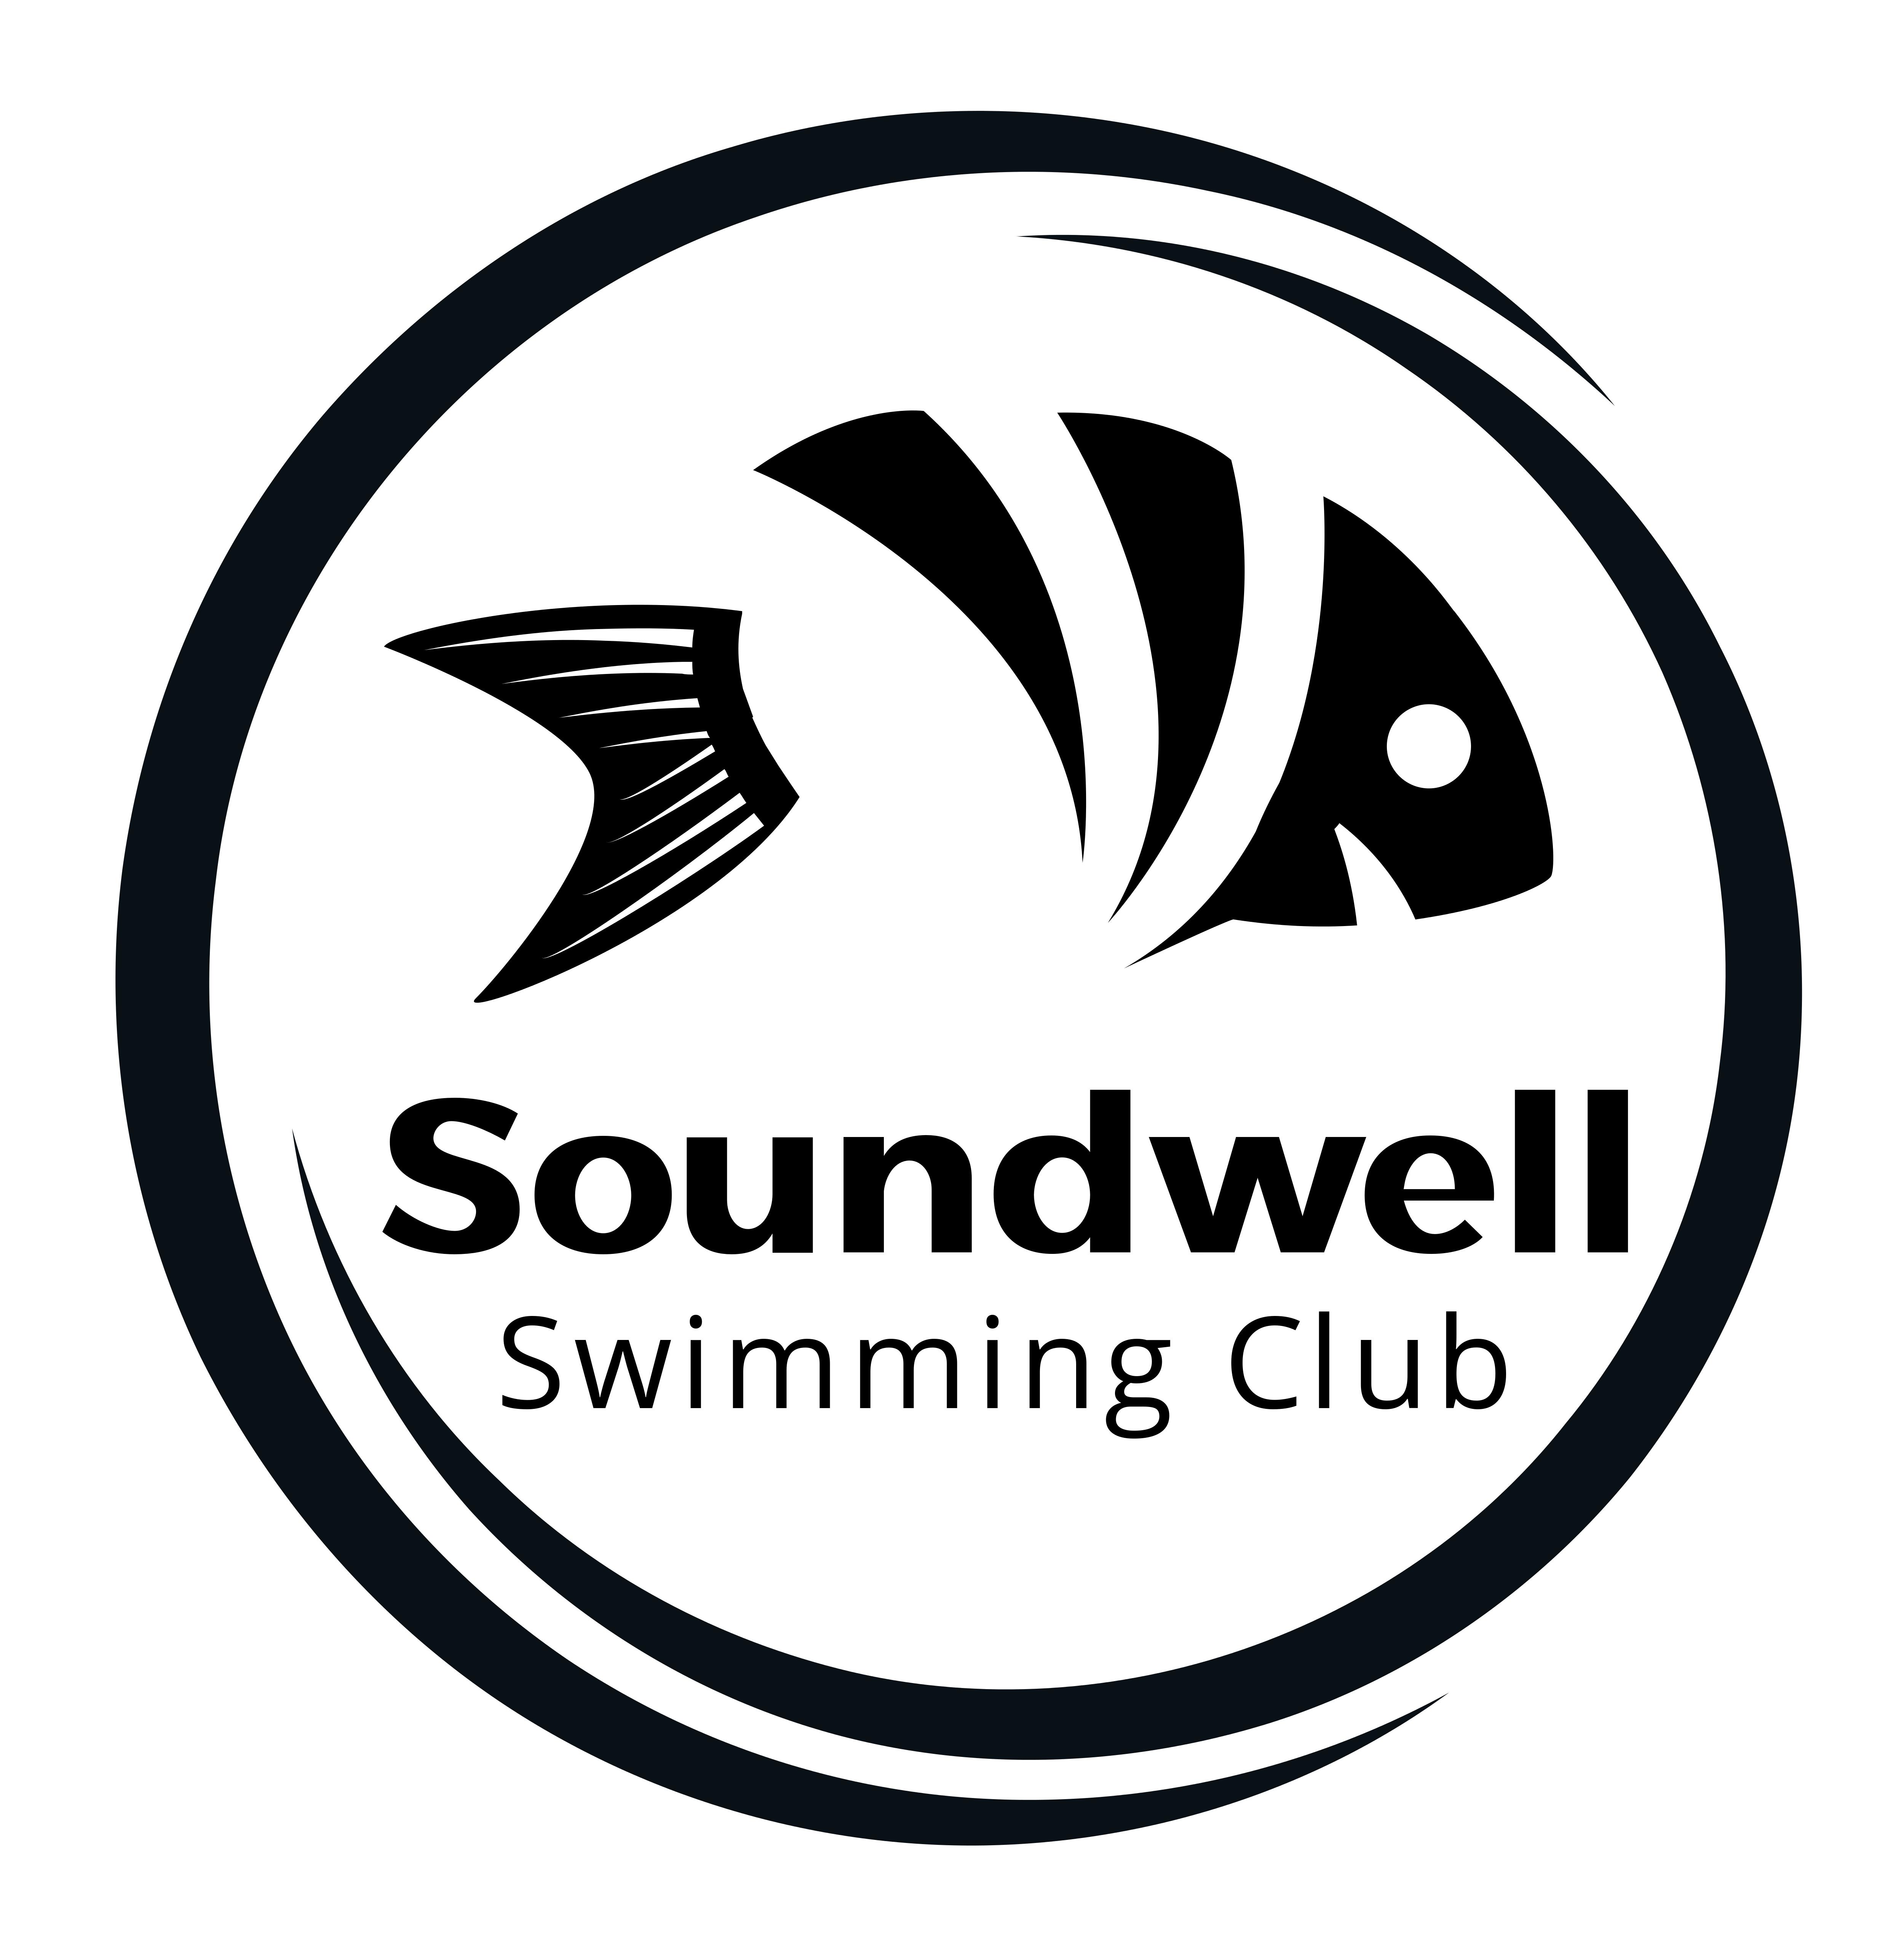 Soundwell Swimming Club : News